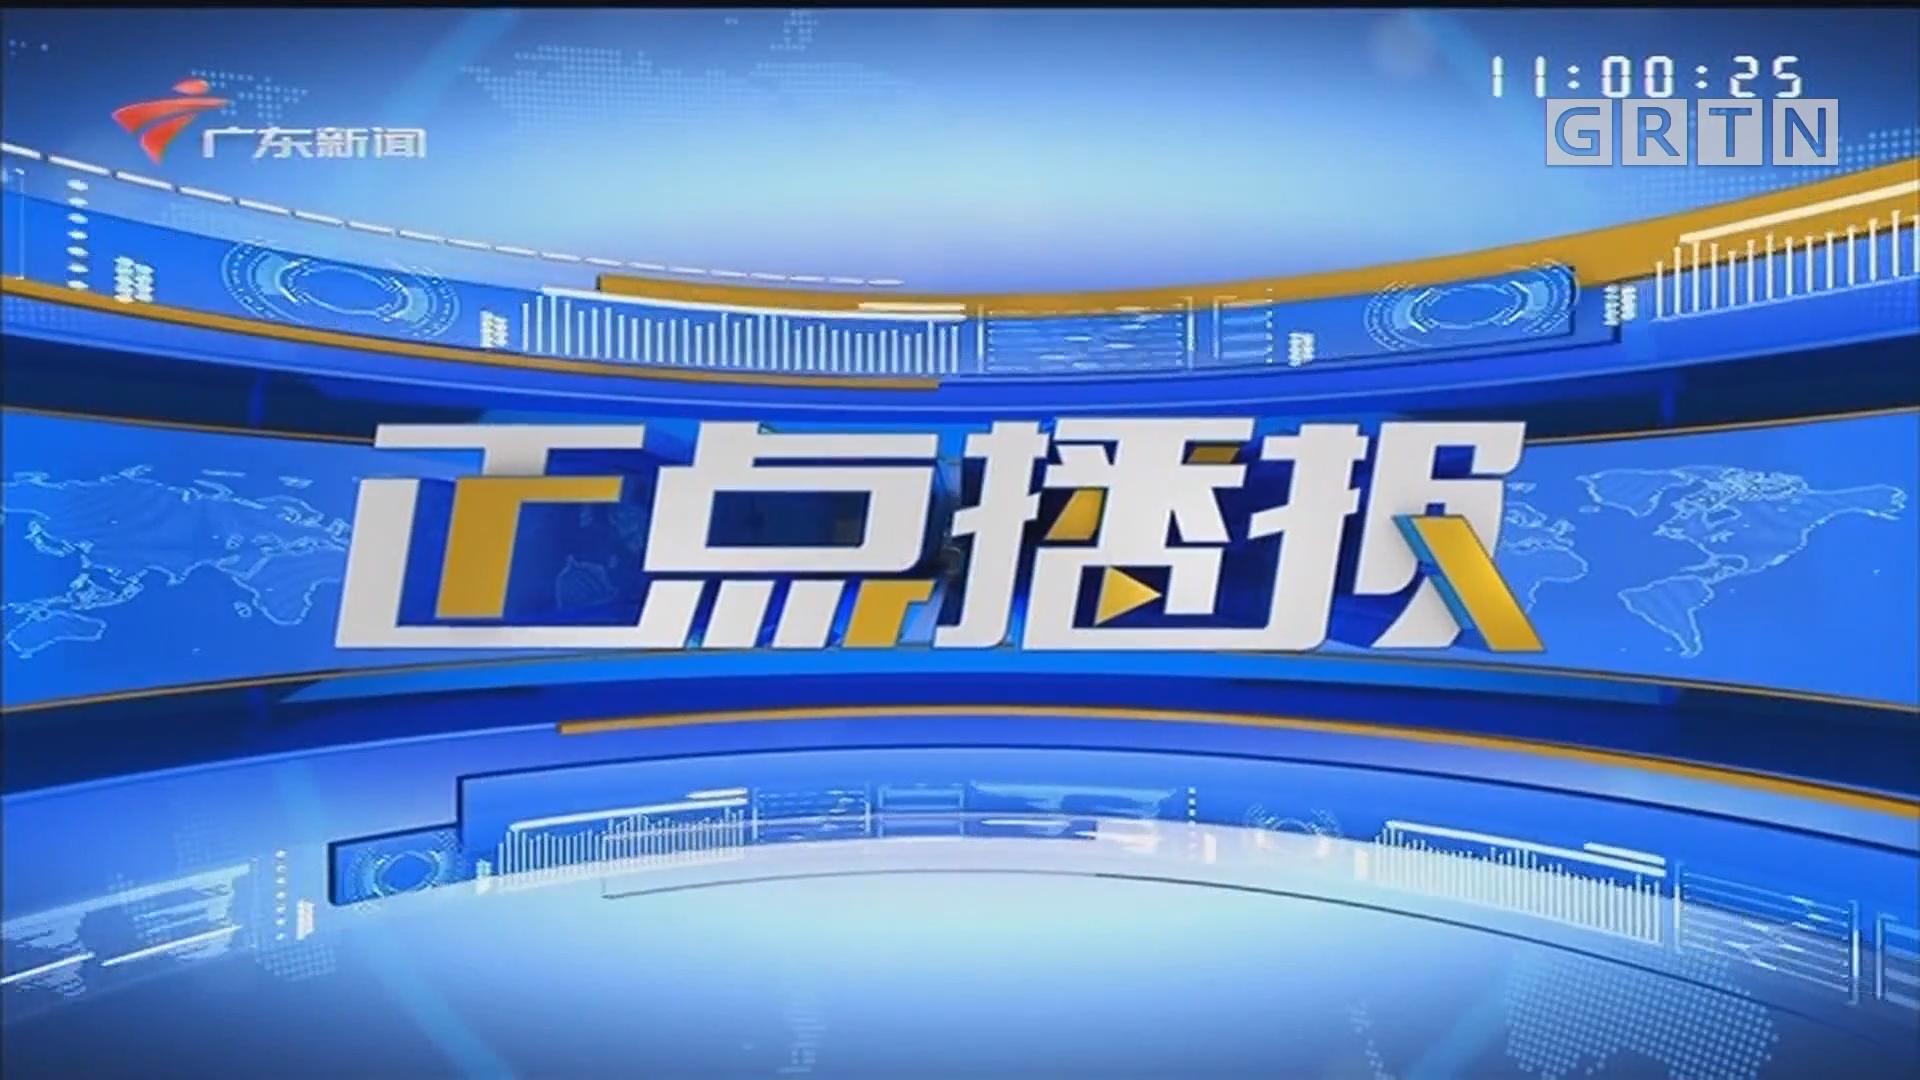 [HD][2020-05-16-11:00]正点播报:惠州:首批毕业生即将离校 依依不舍告别校园